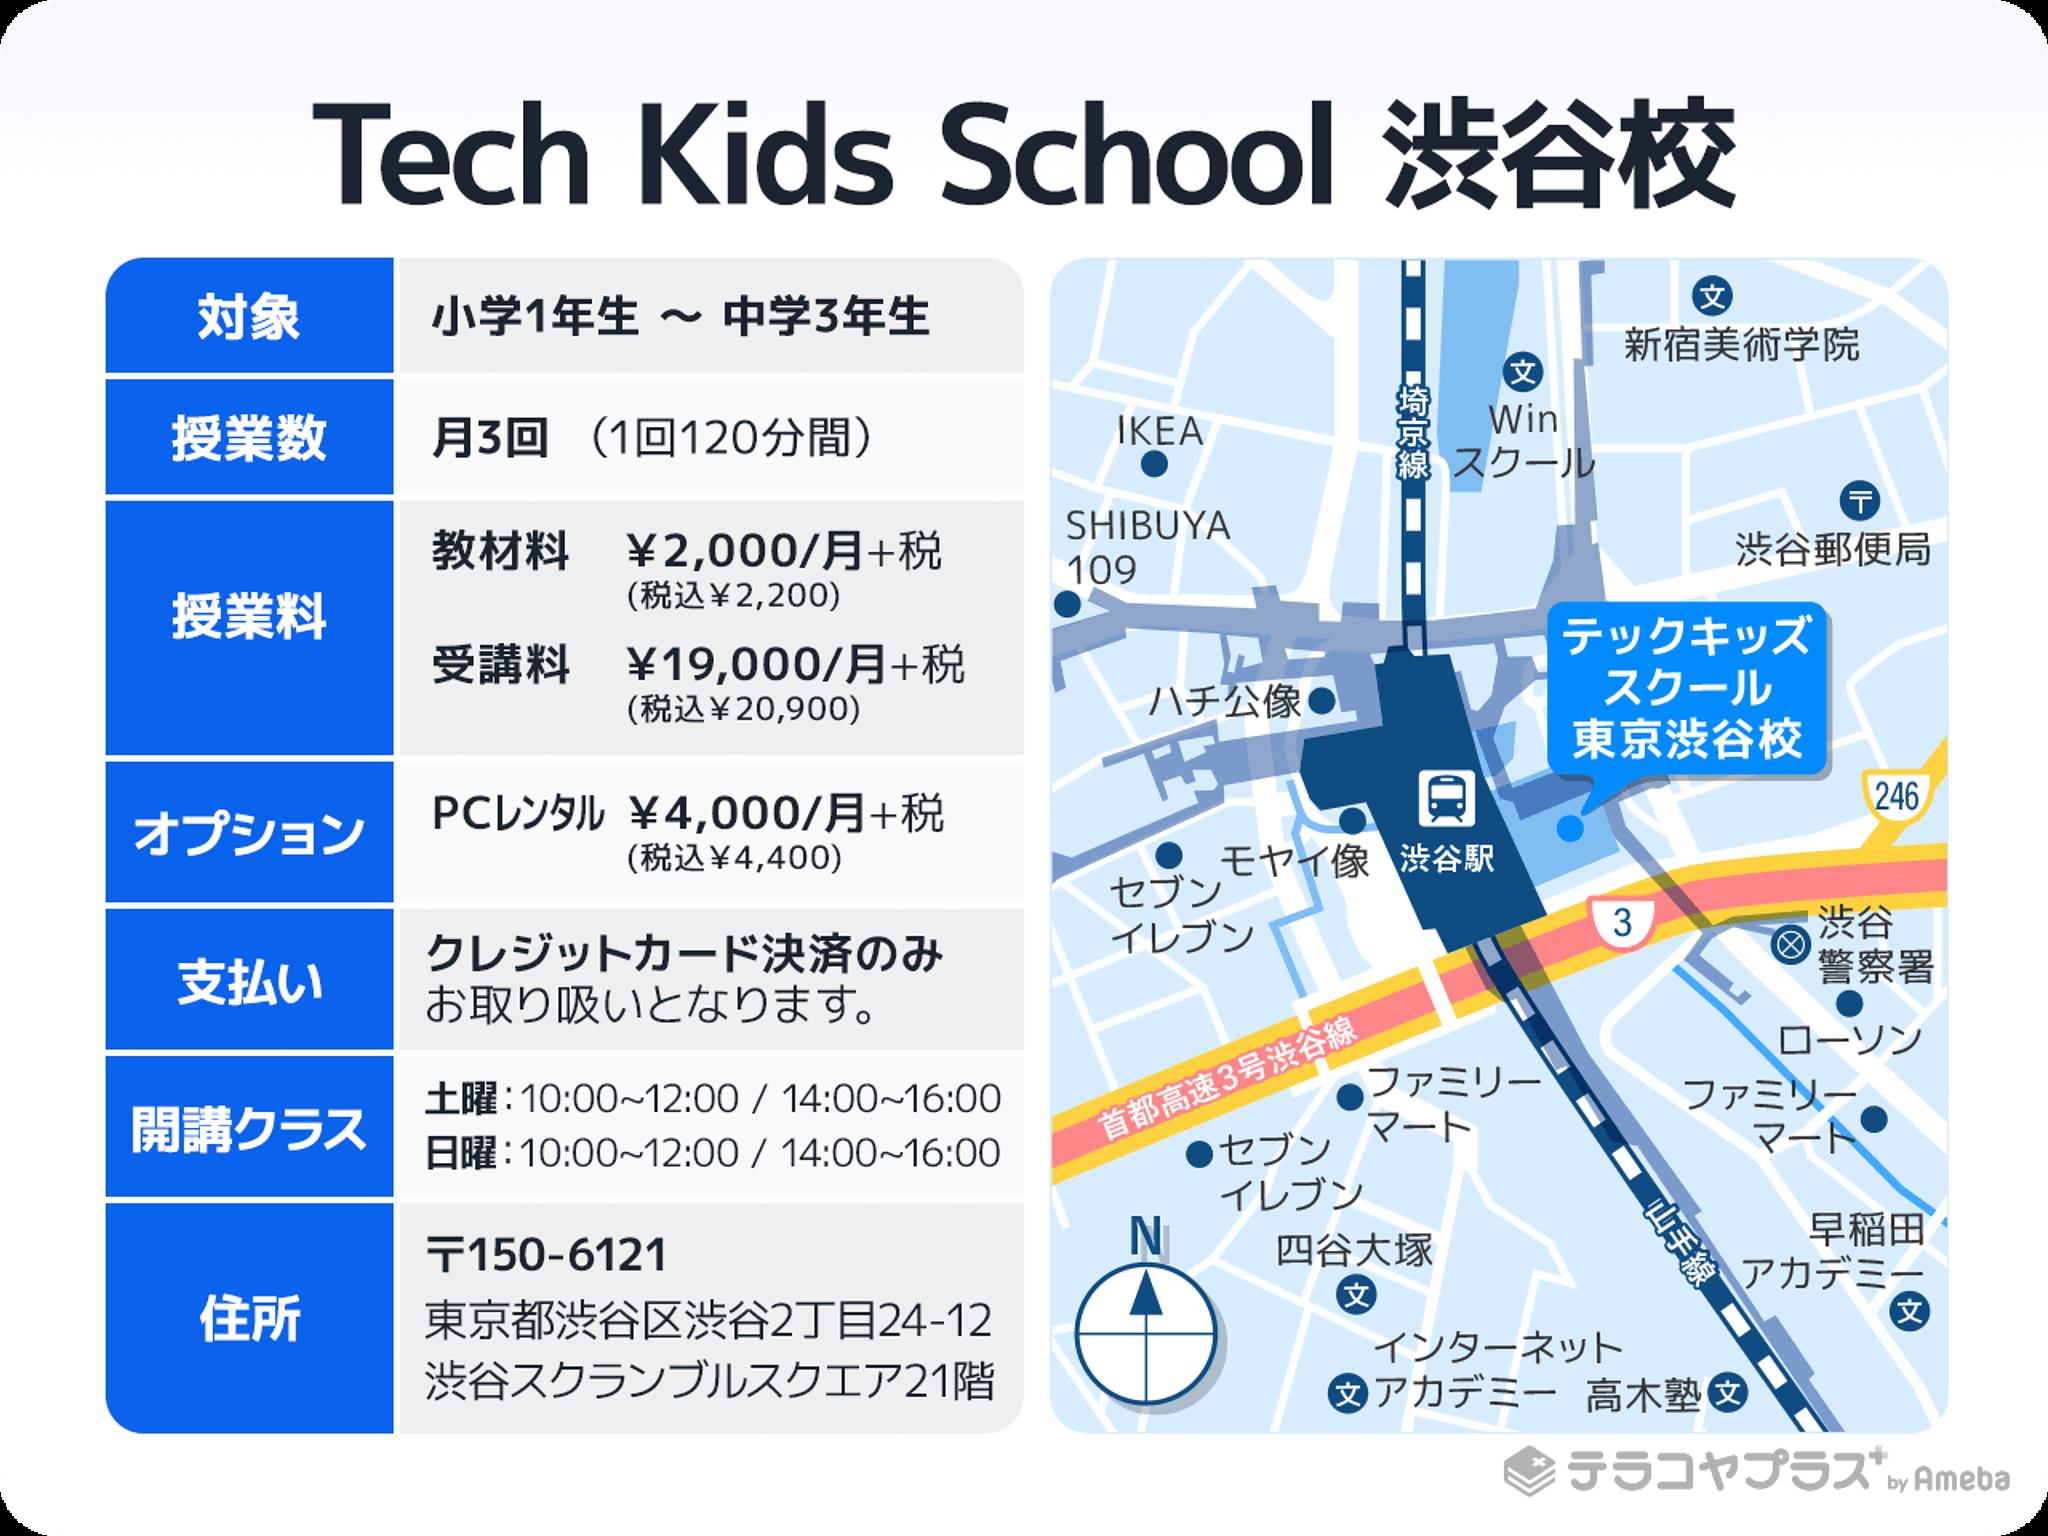 「Tech Kids School」渋谷校の料金とアクセス